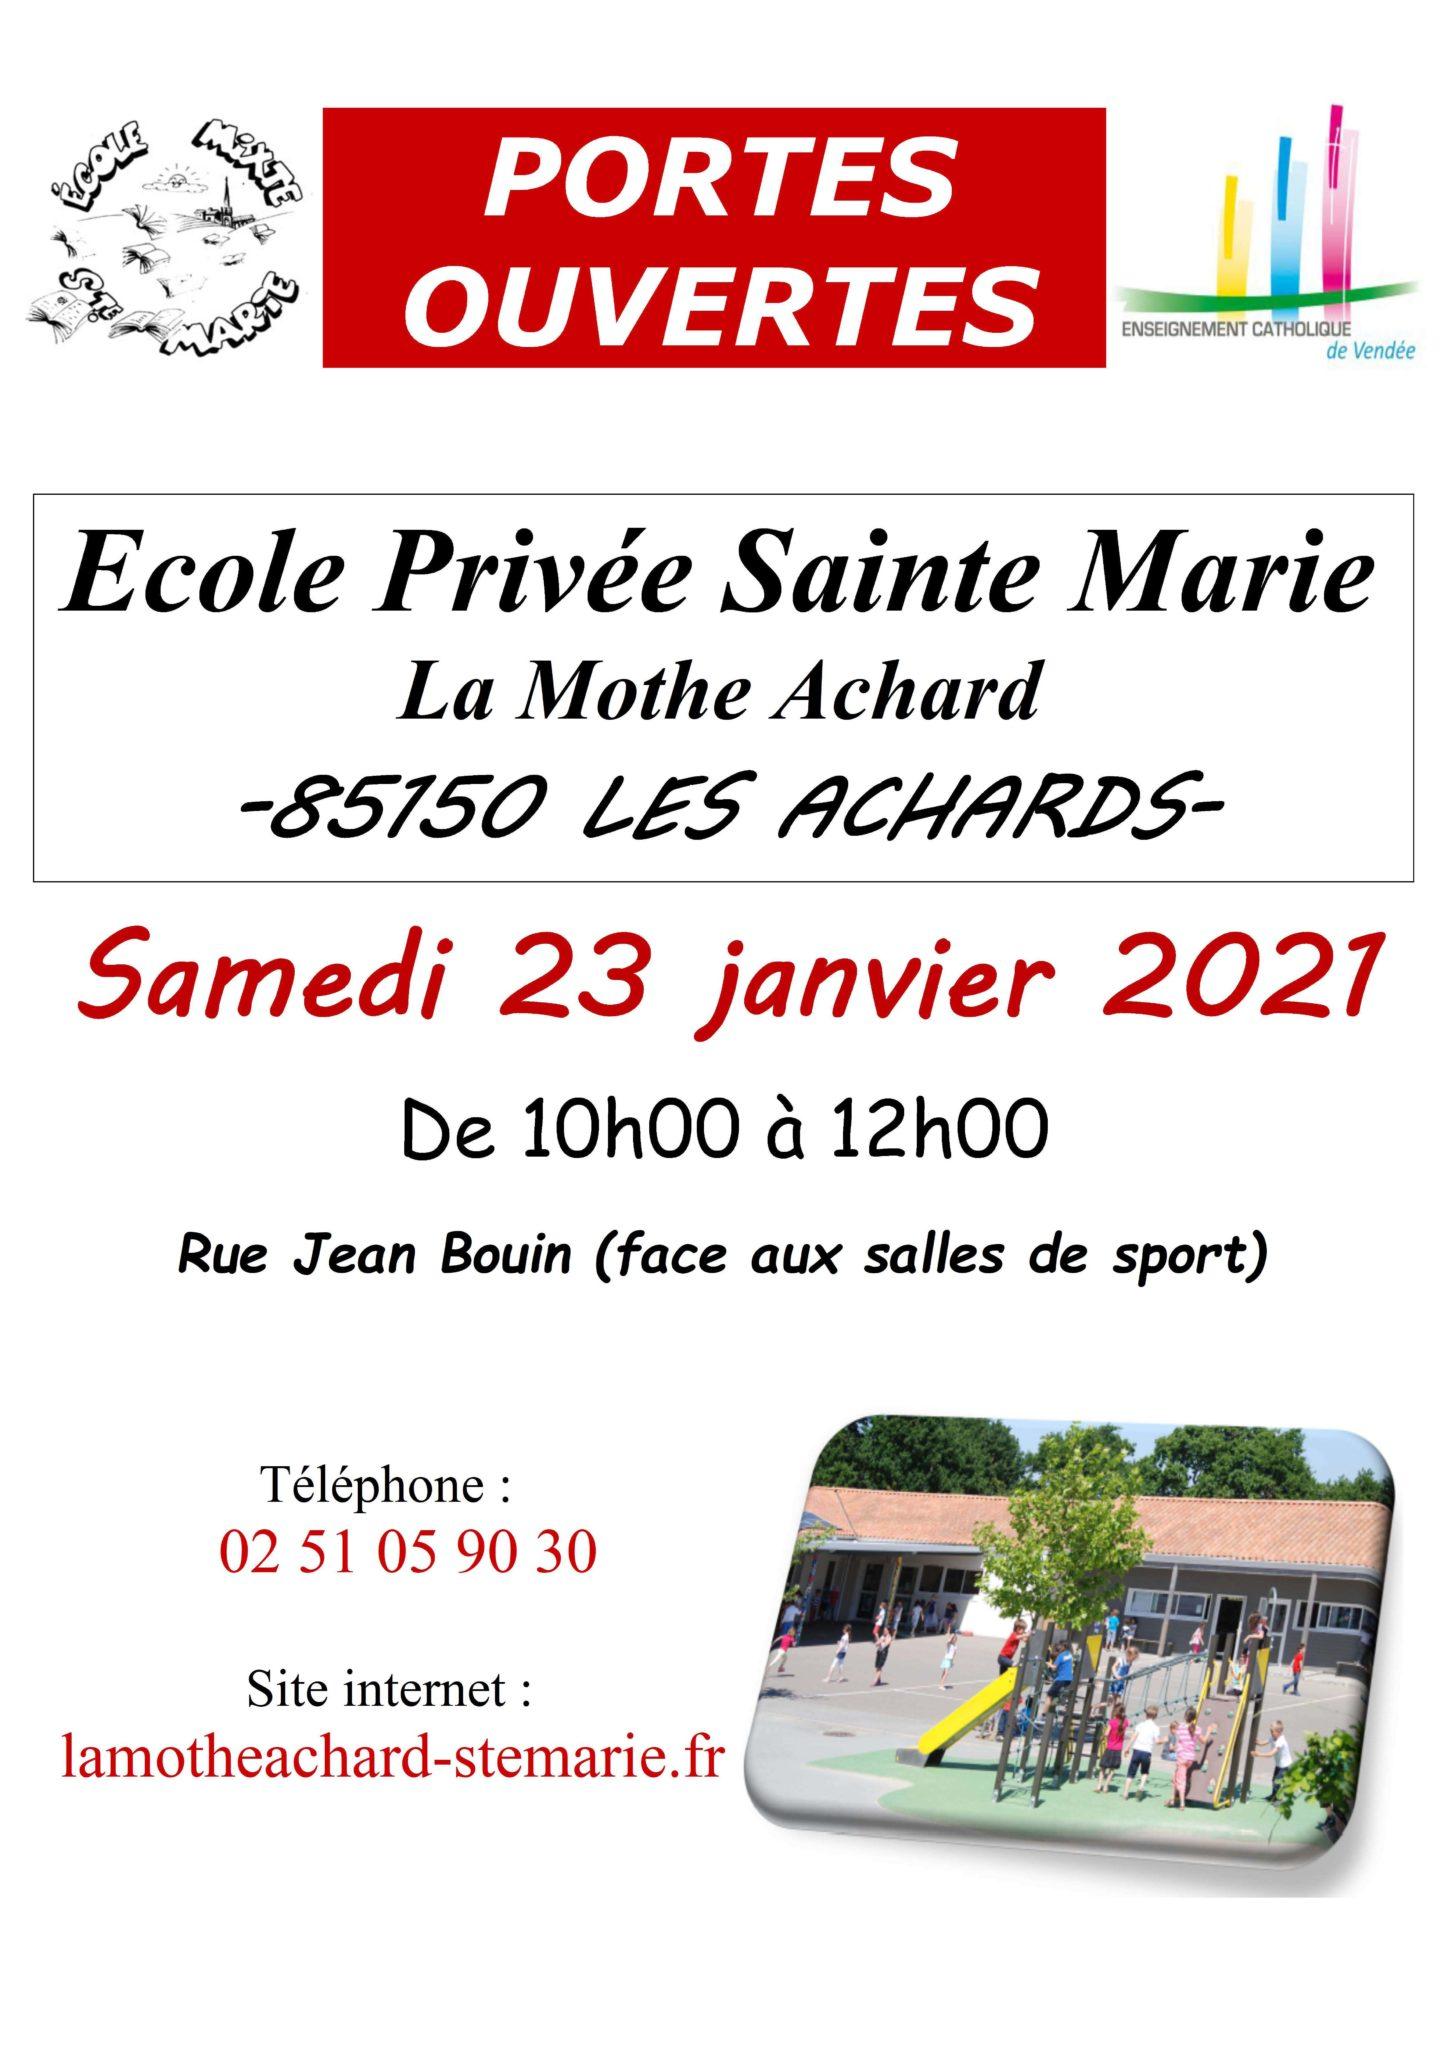 Portes-ouvertes-sainte-mairie-2021